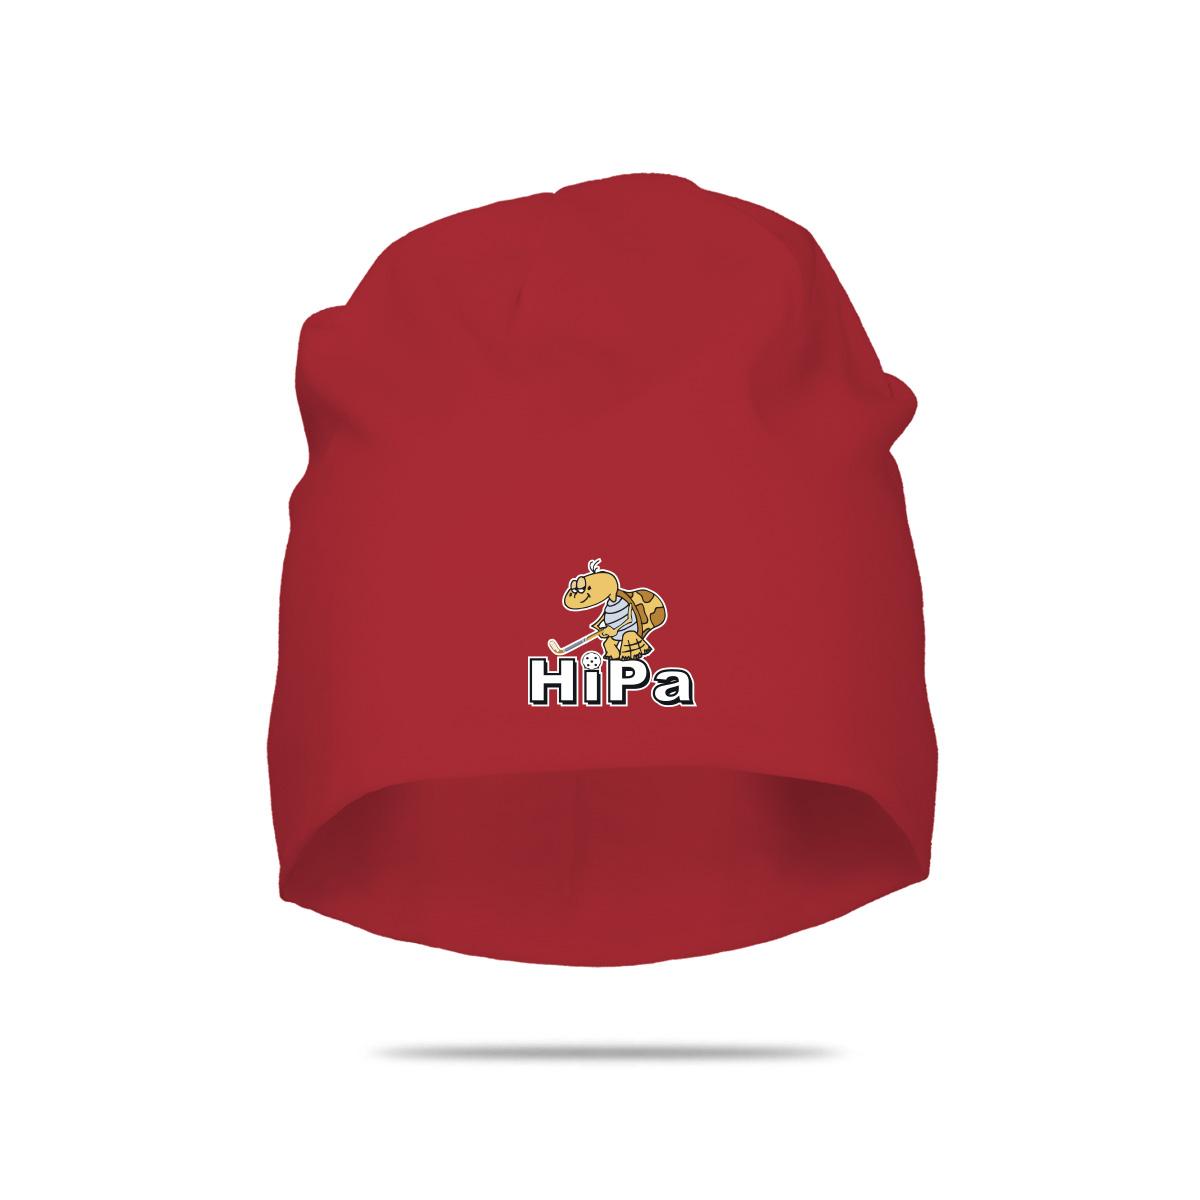 Teamprint-Pujo-HiPa-Punainen